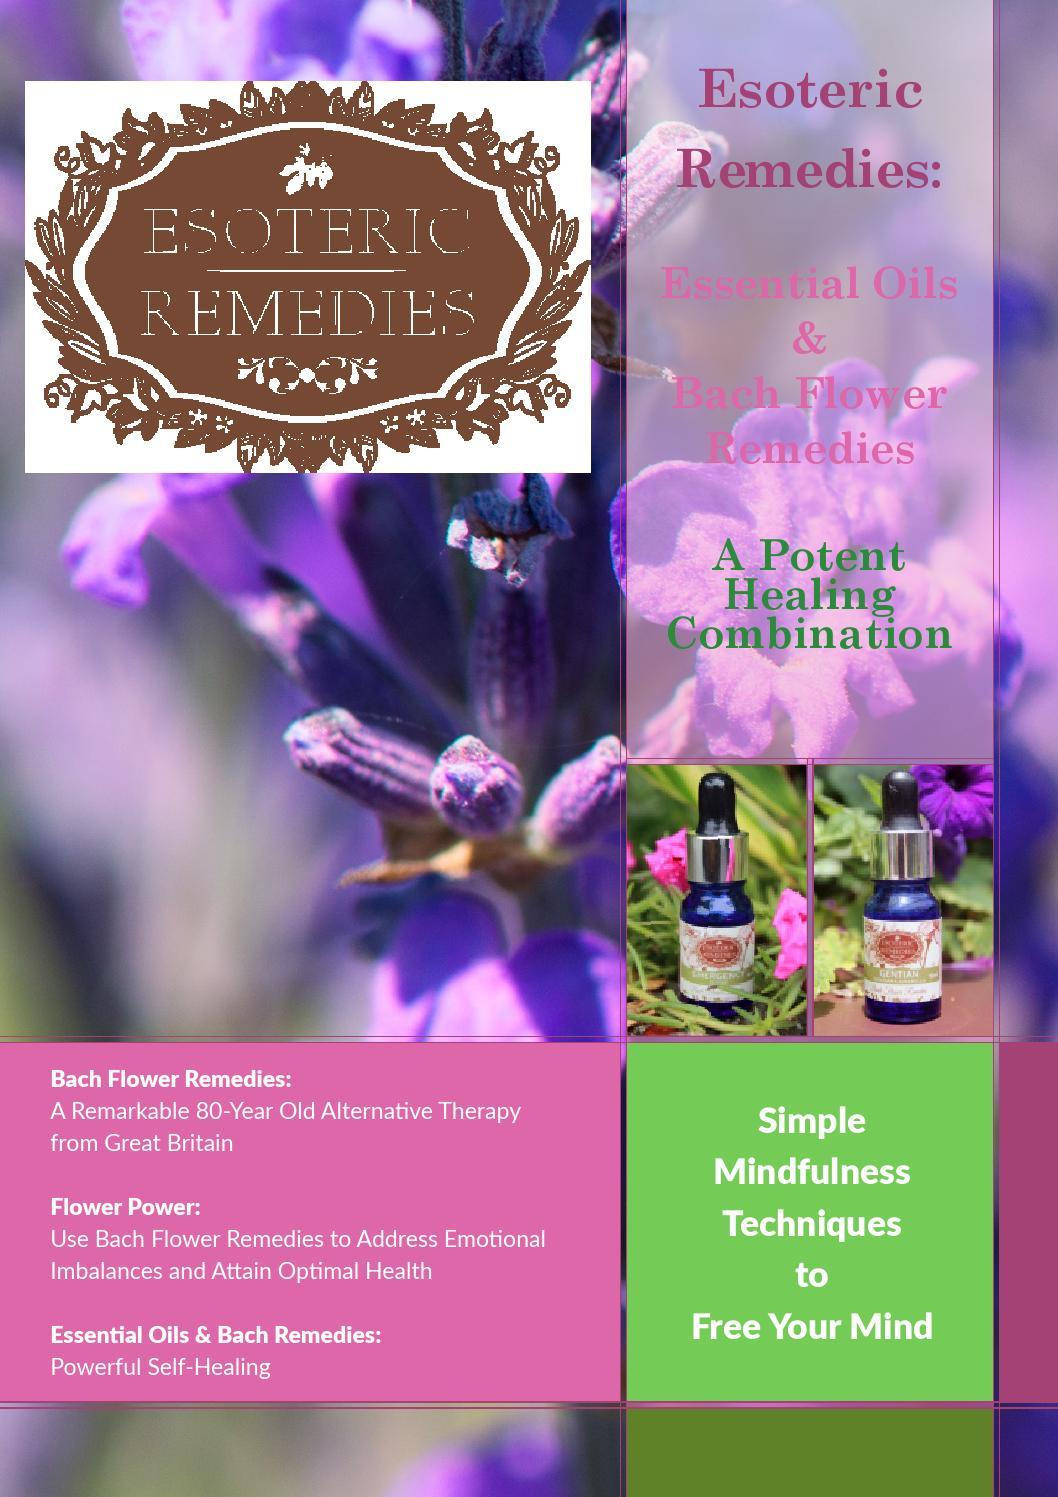 Esoteric Remedies: Essential Oils & Bach Flower Remedies - A